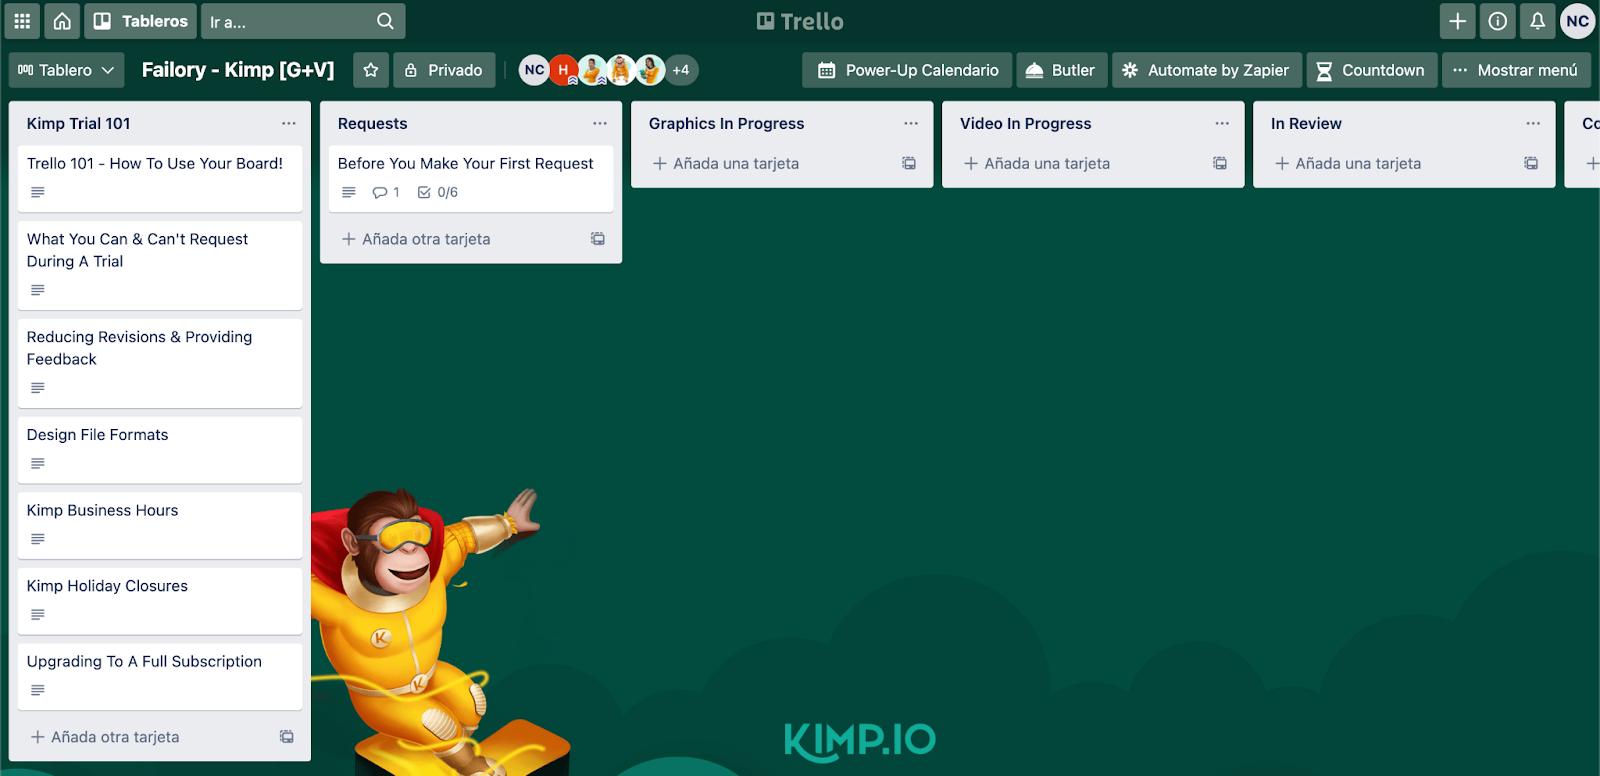 Kimp Trello Dashboard